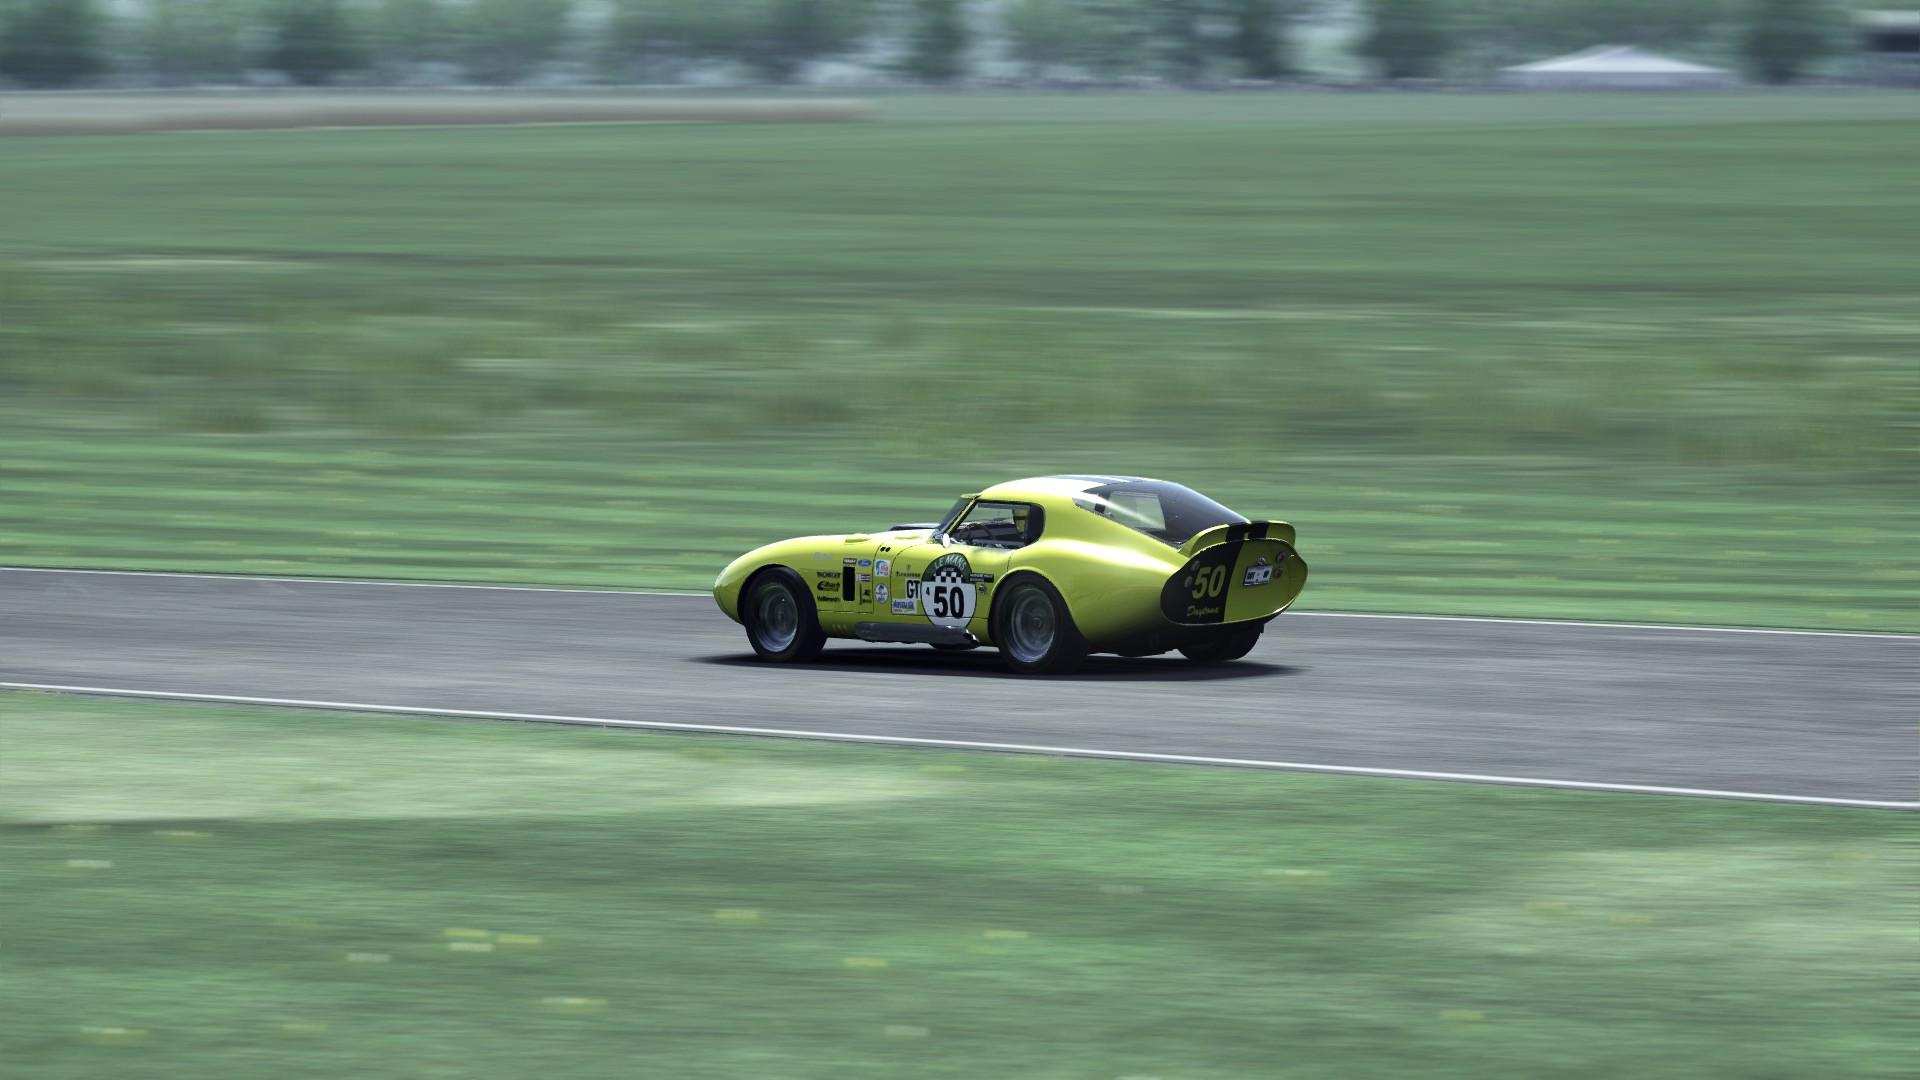 Shelby Daytona Coupe at Goodwood 1.16.x 077_032018.jpg